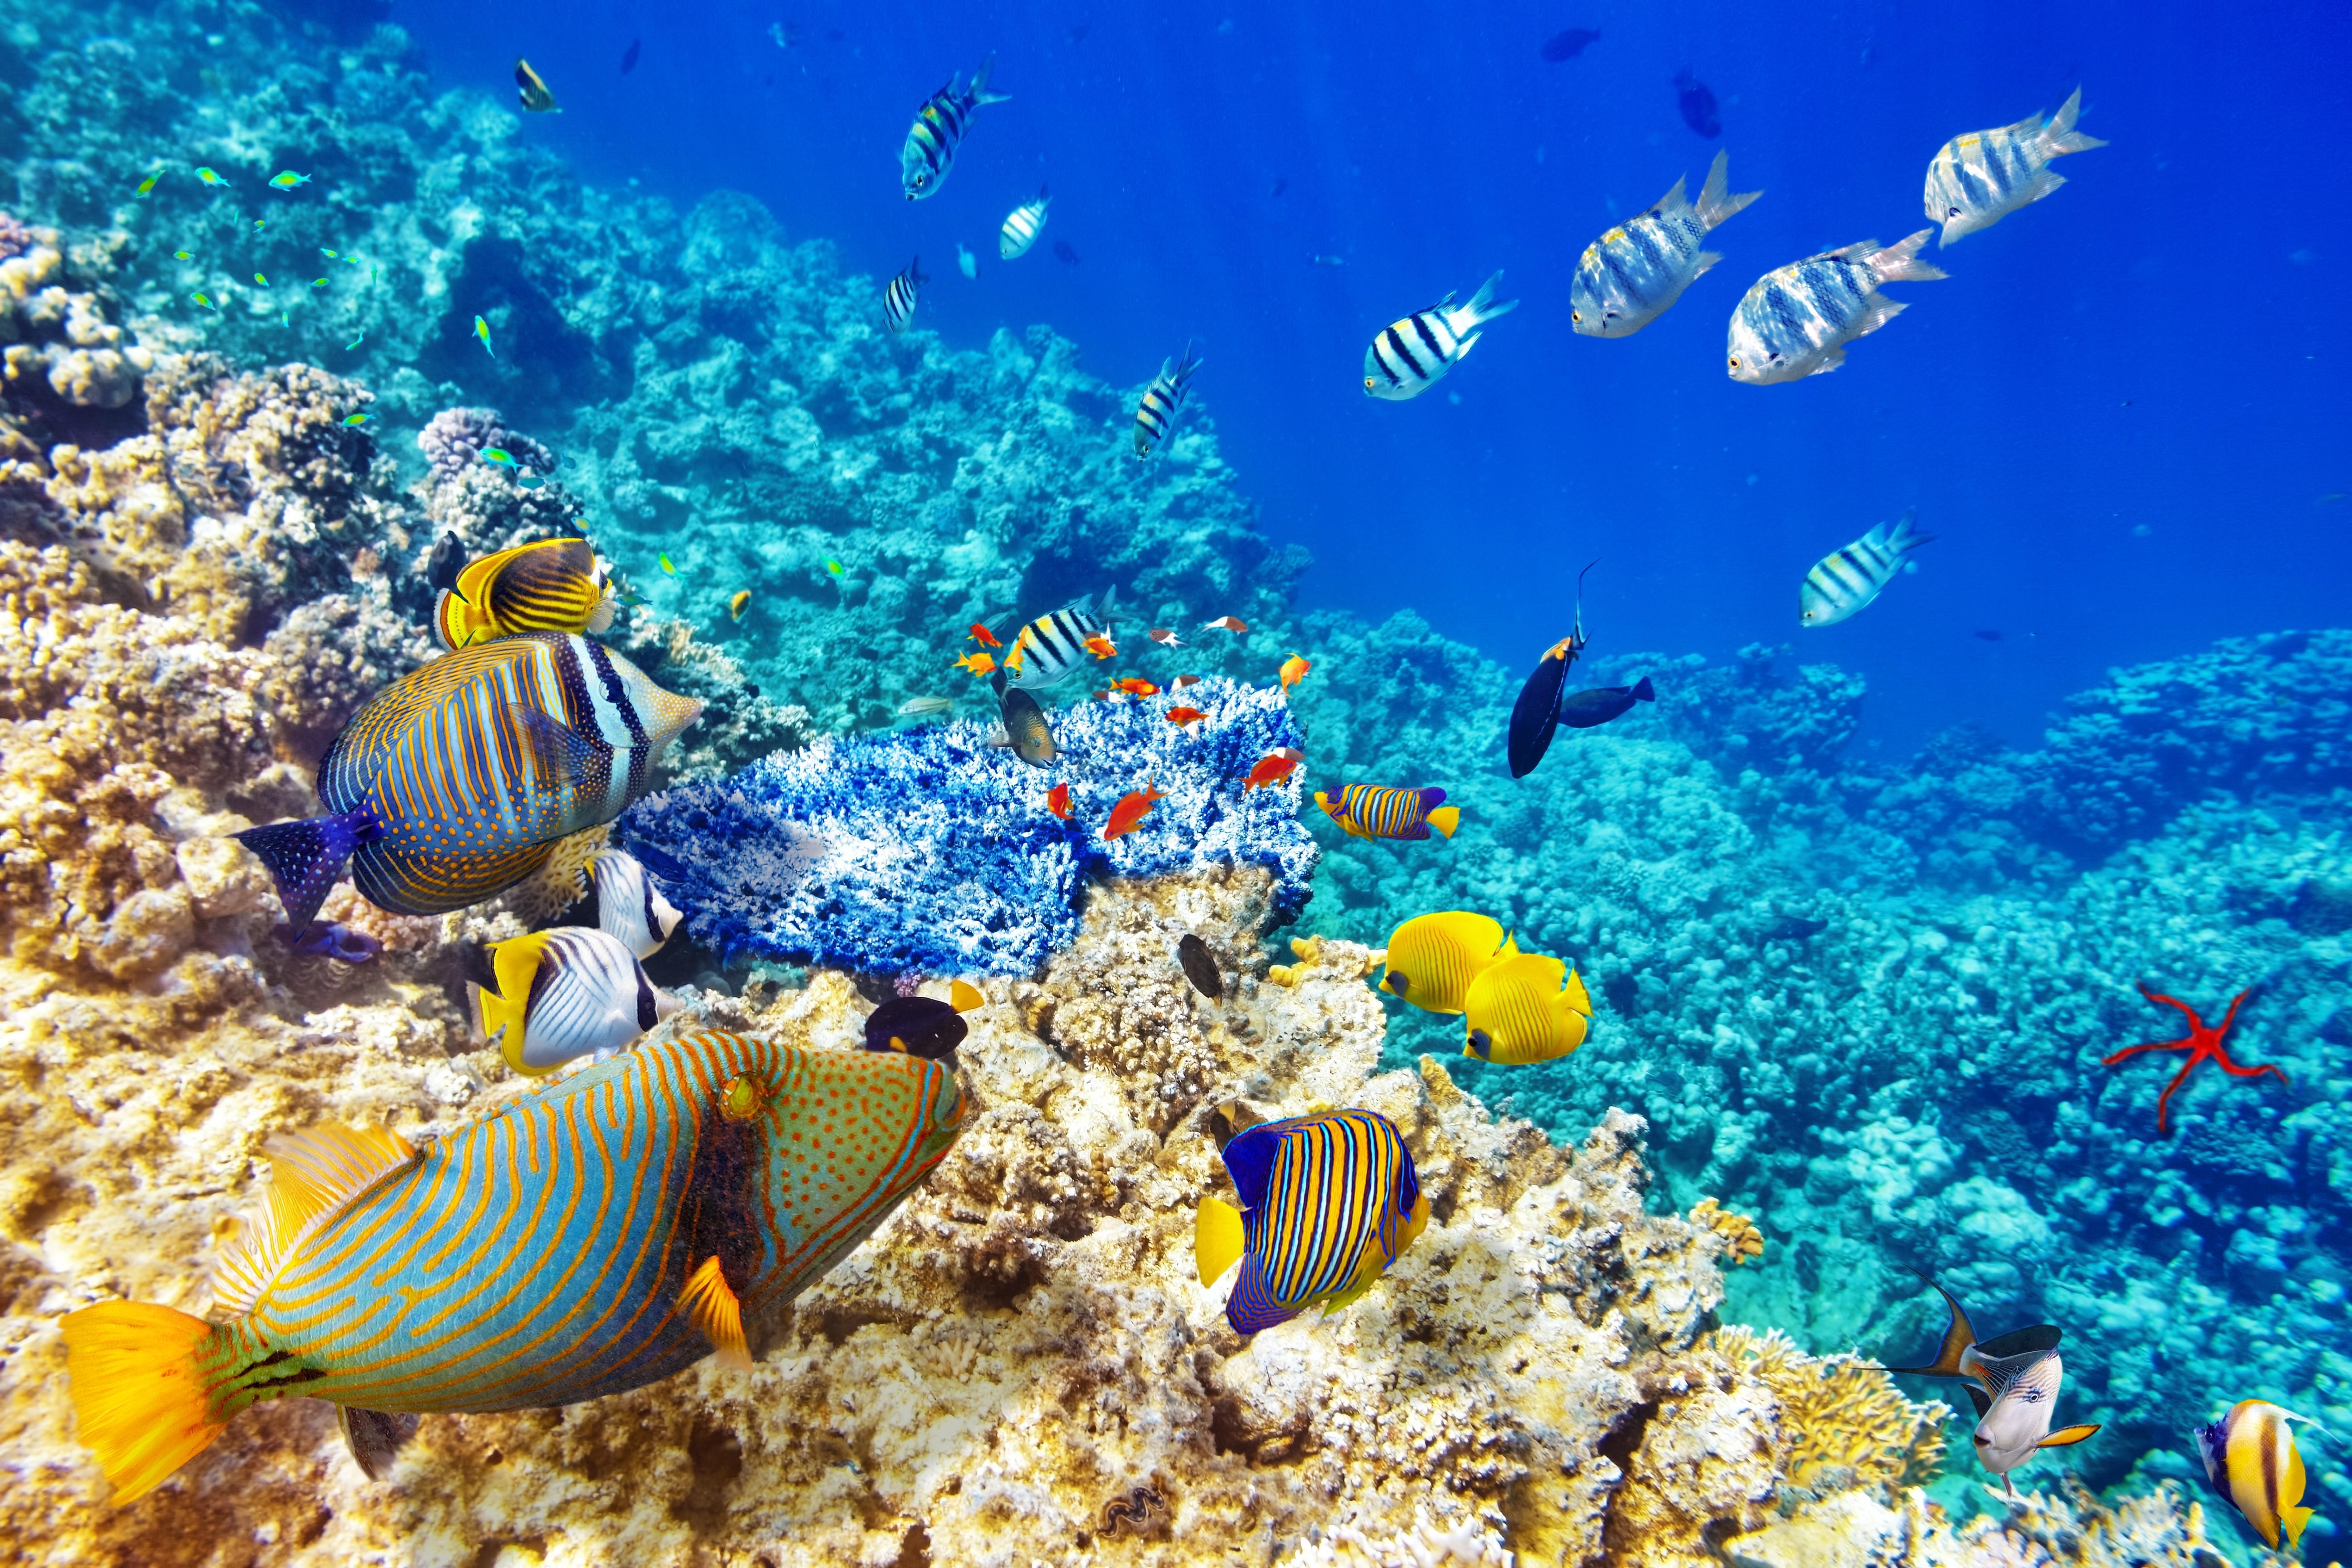 Wallpaper : animals, sea, underwater, coral reef, diving ... - photo#33